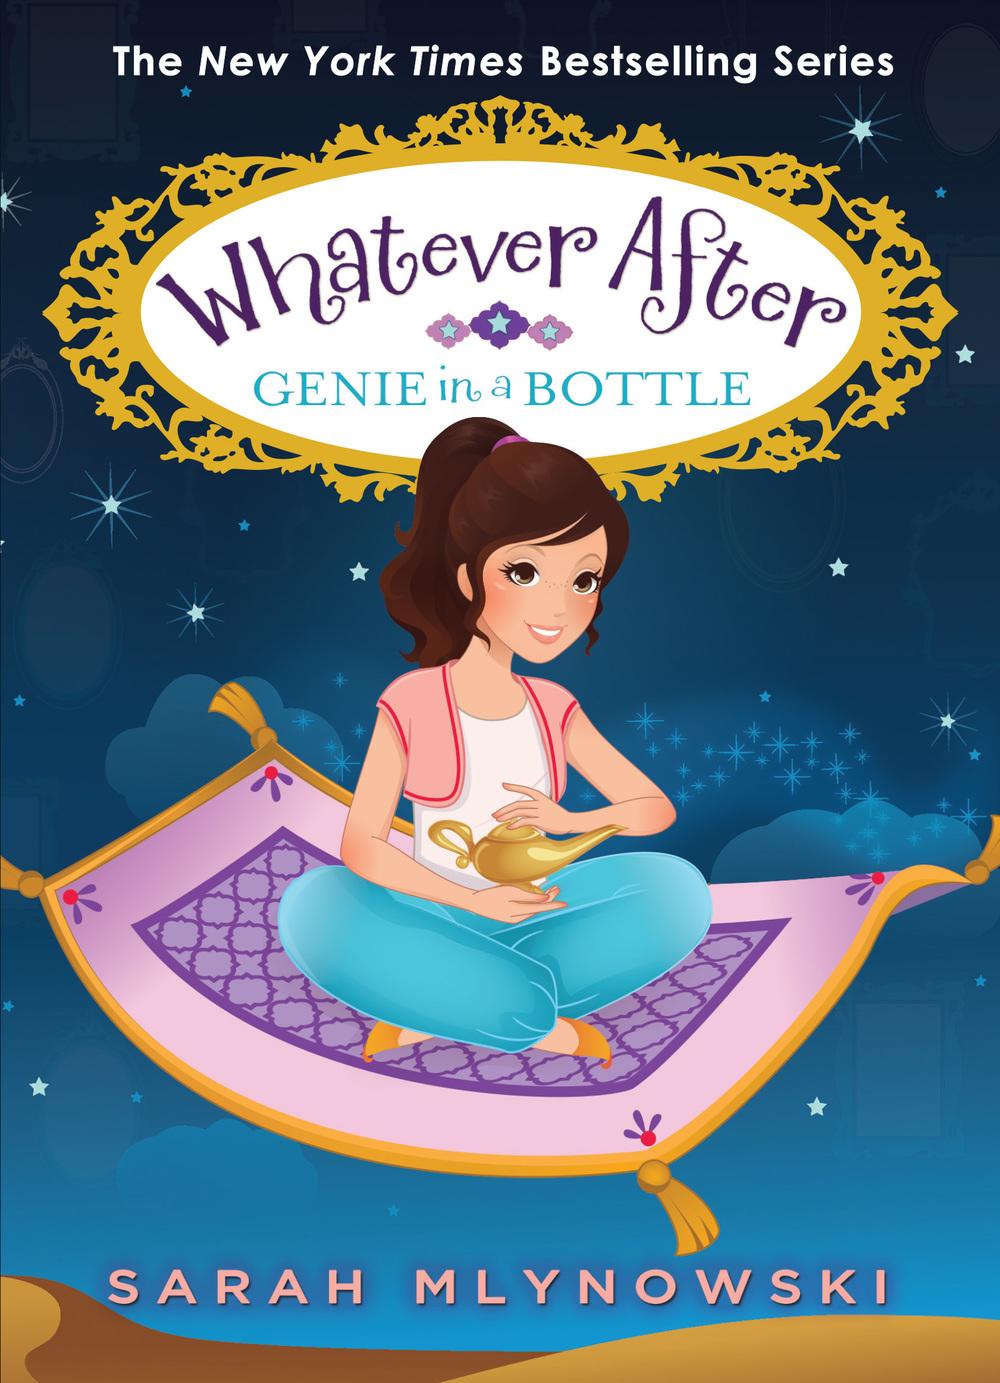 mlynowski-whatever-after-genie-bottle.jpg